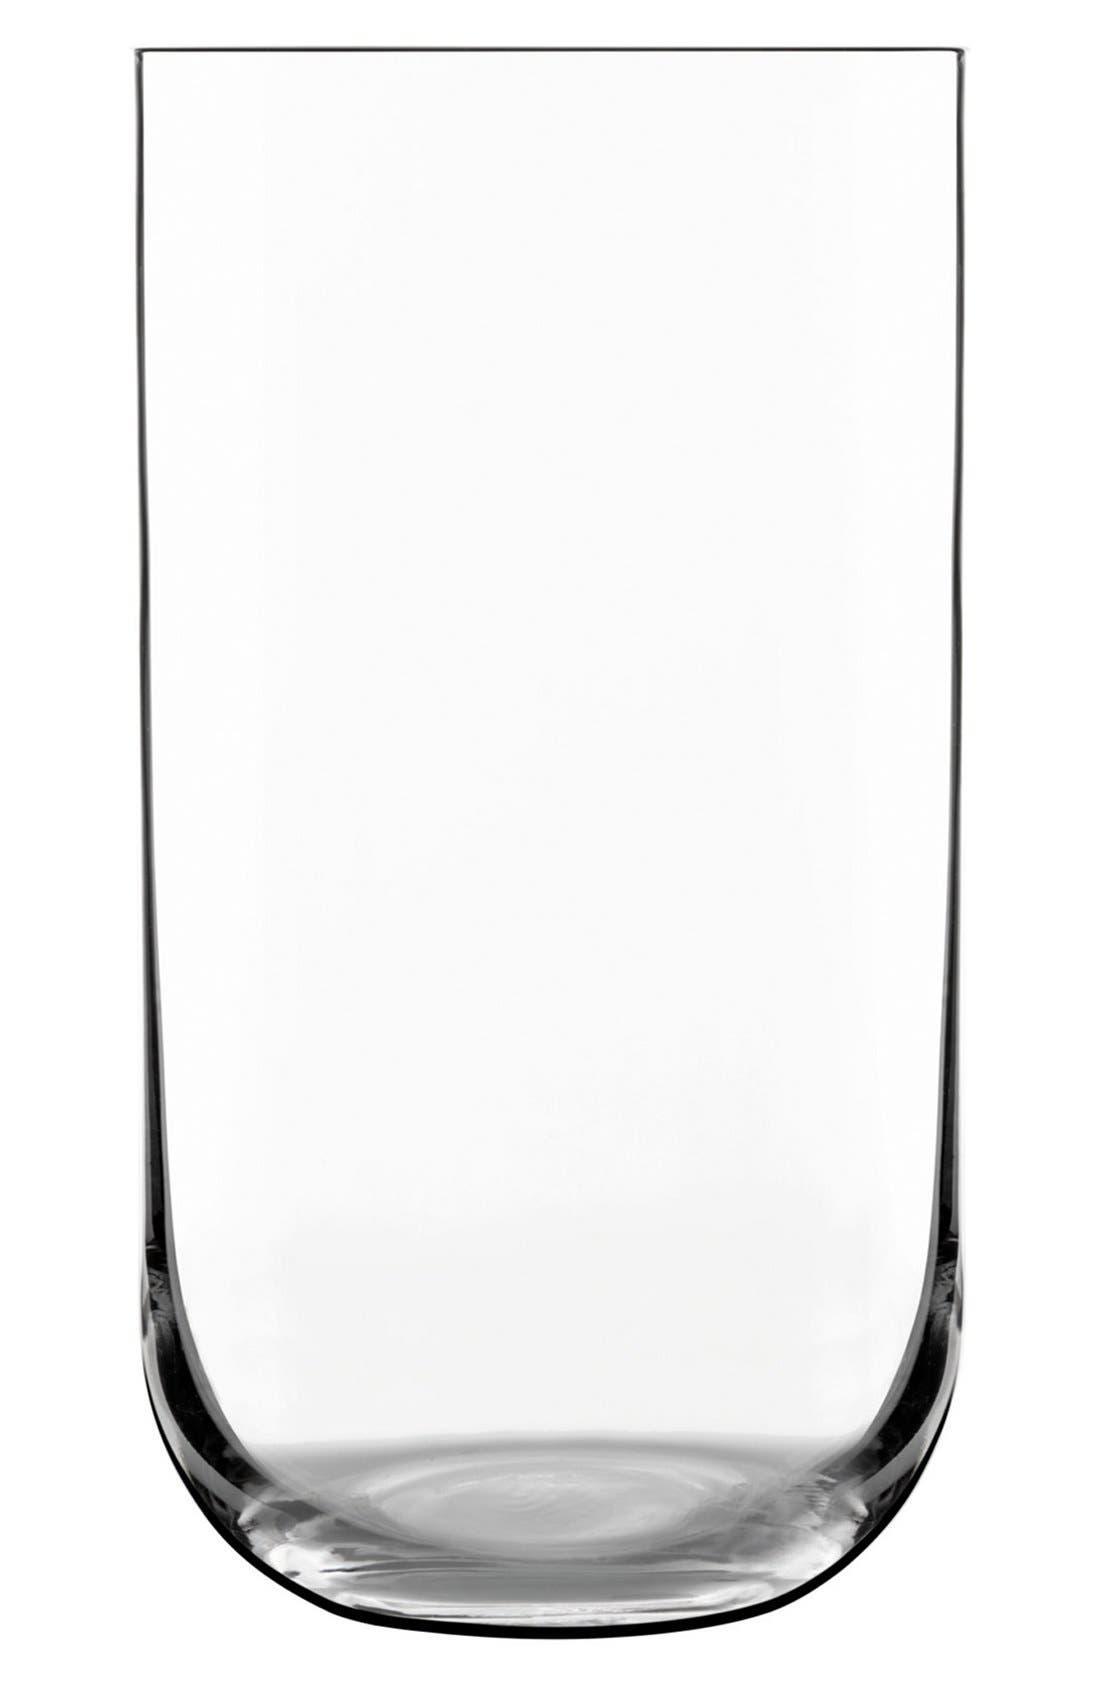 'Sublime' Beverage Glasses,                             Main thumbnail 1, color,                             CLEAR